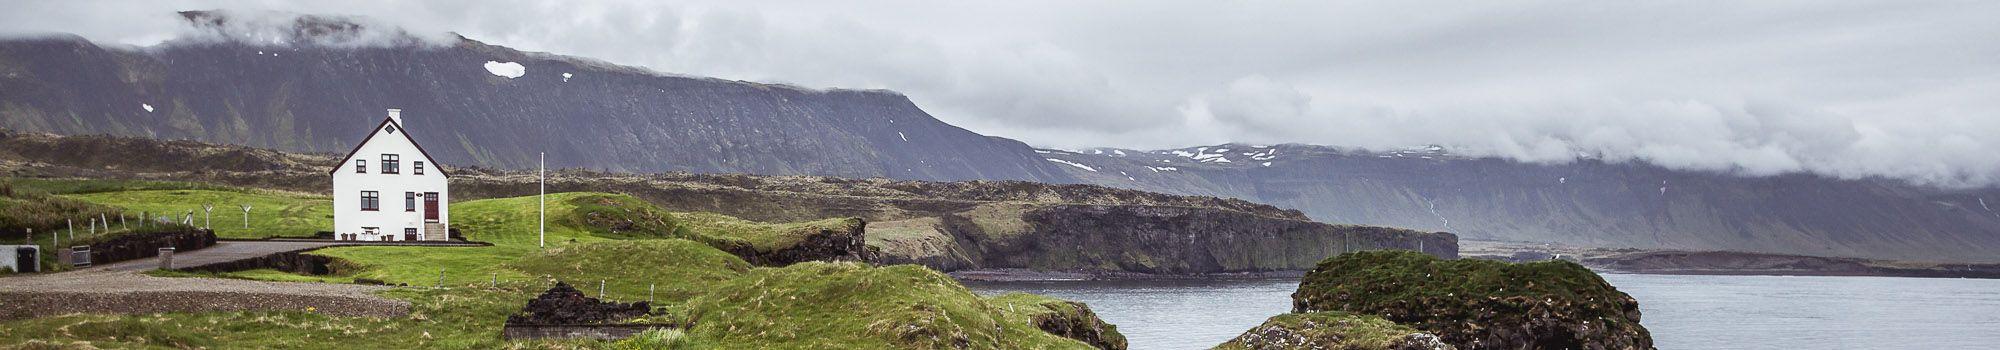 Snaefellsnes-peninsula-Arnarstapi-tour-Iceland